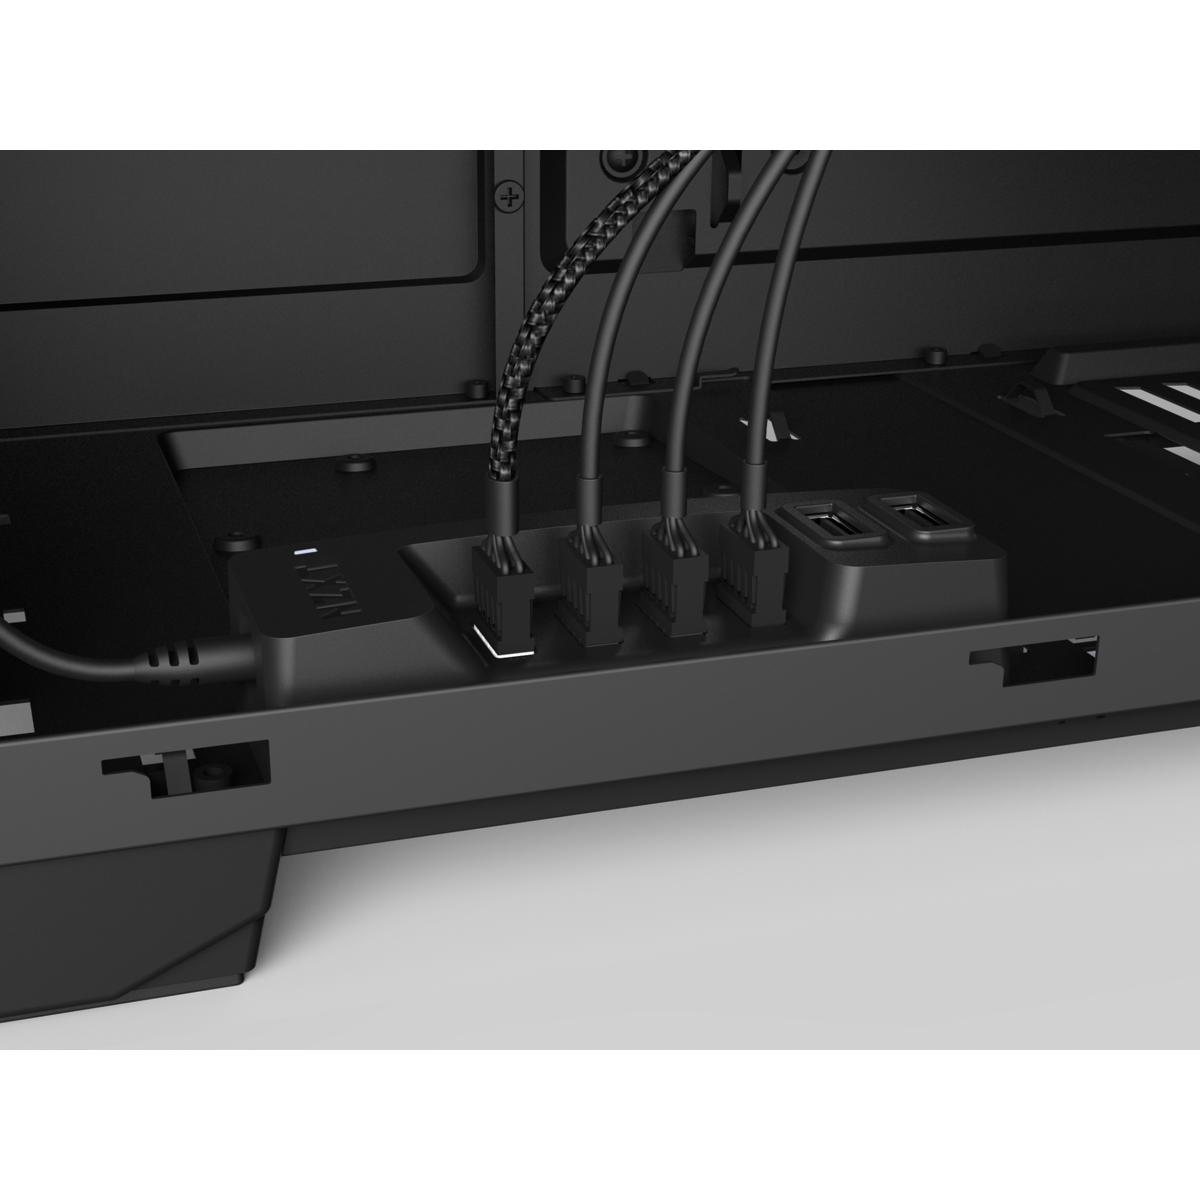 HUB Interno USB NZXT, 5 Portas, AC-IUSBH-M1